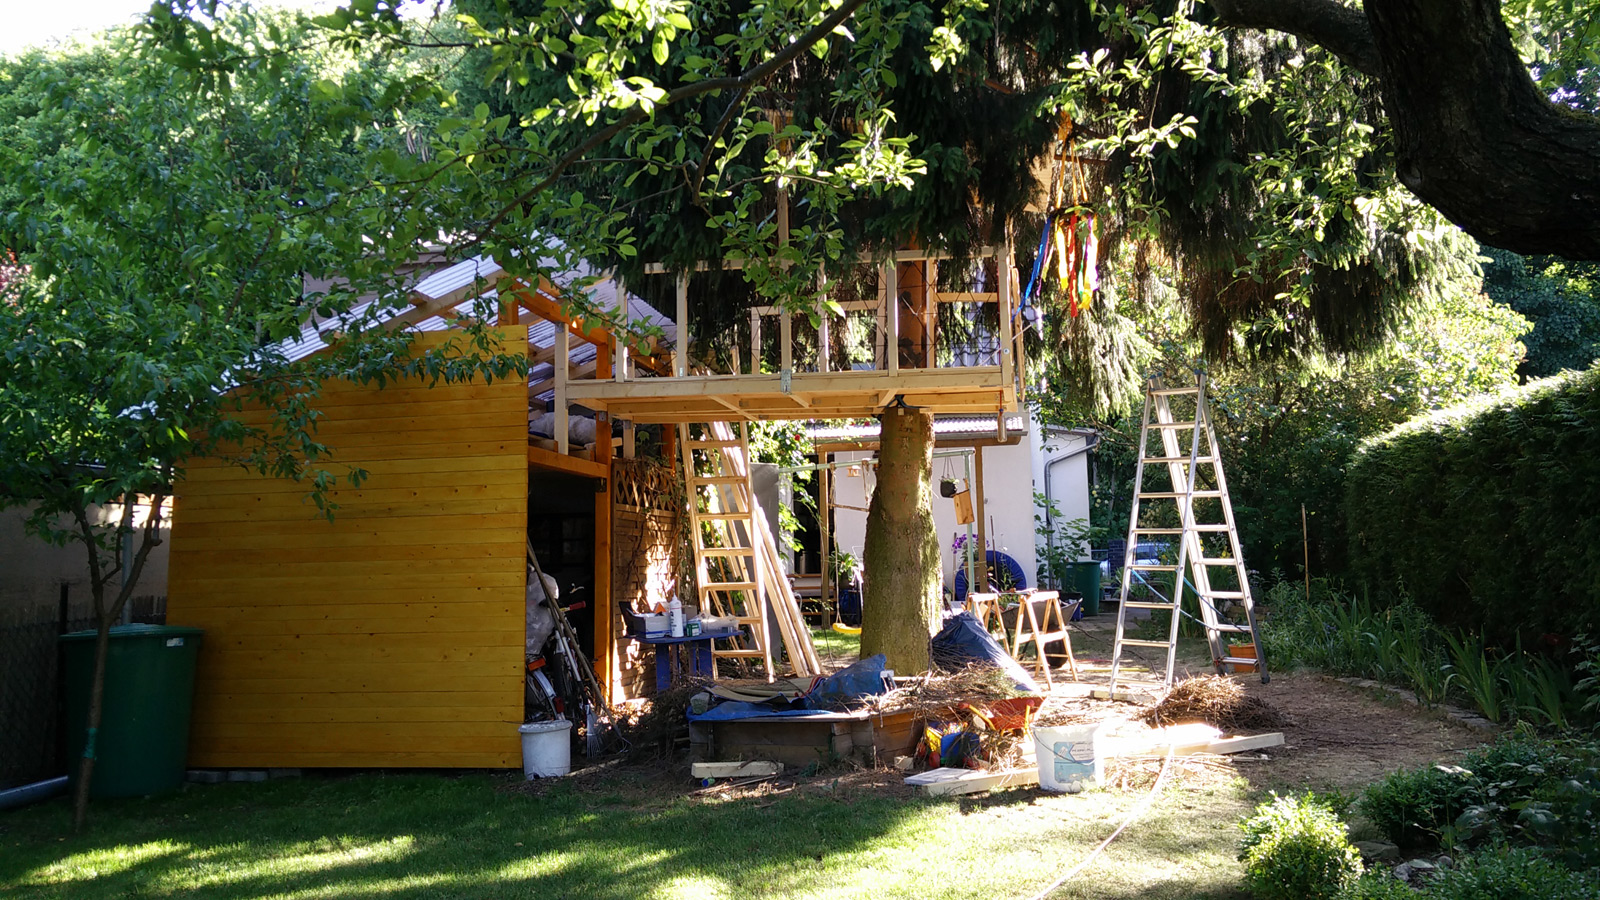 SamHouse Real Bennat Projekt Design Architektur Bau Baumhaus